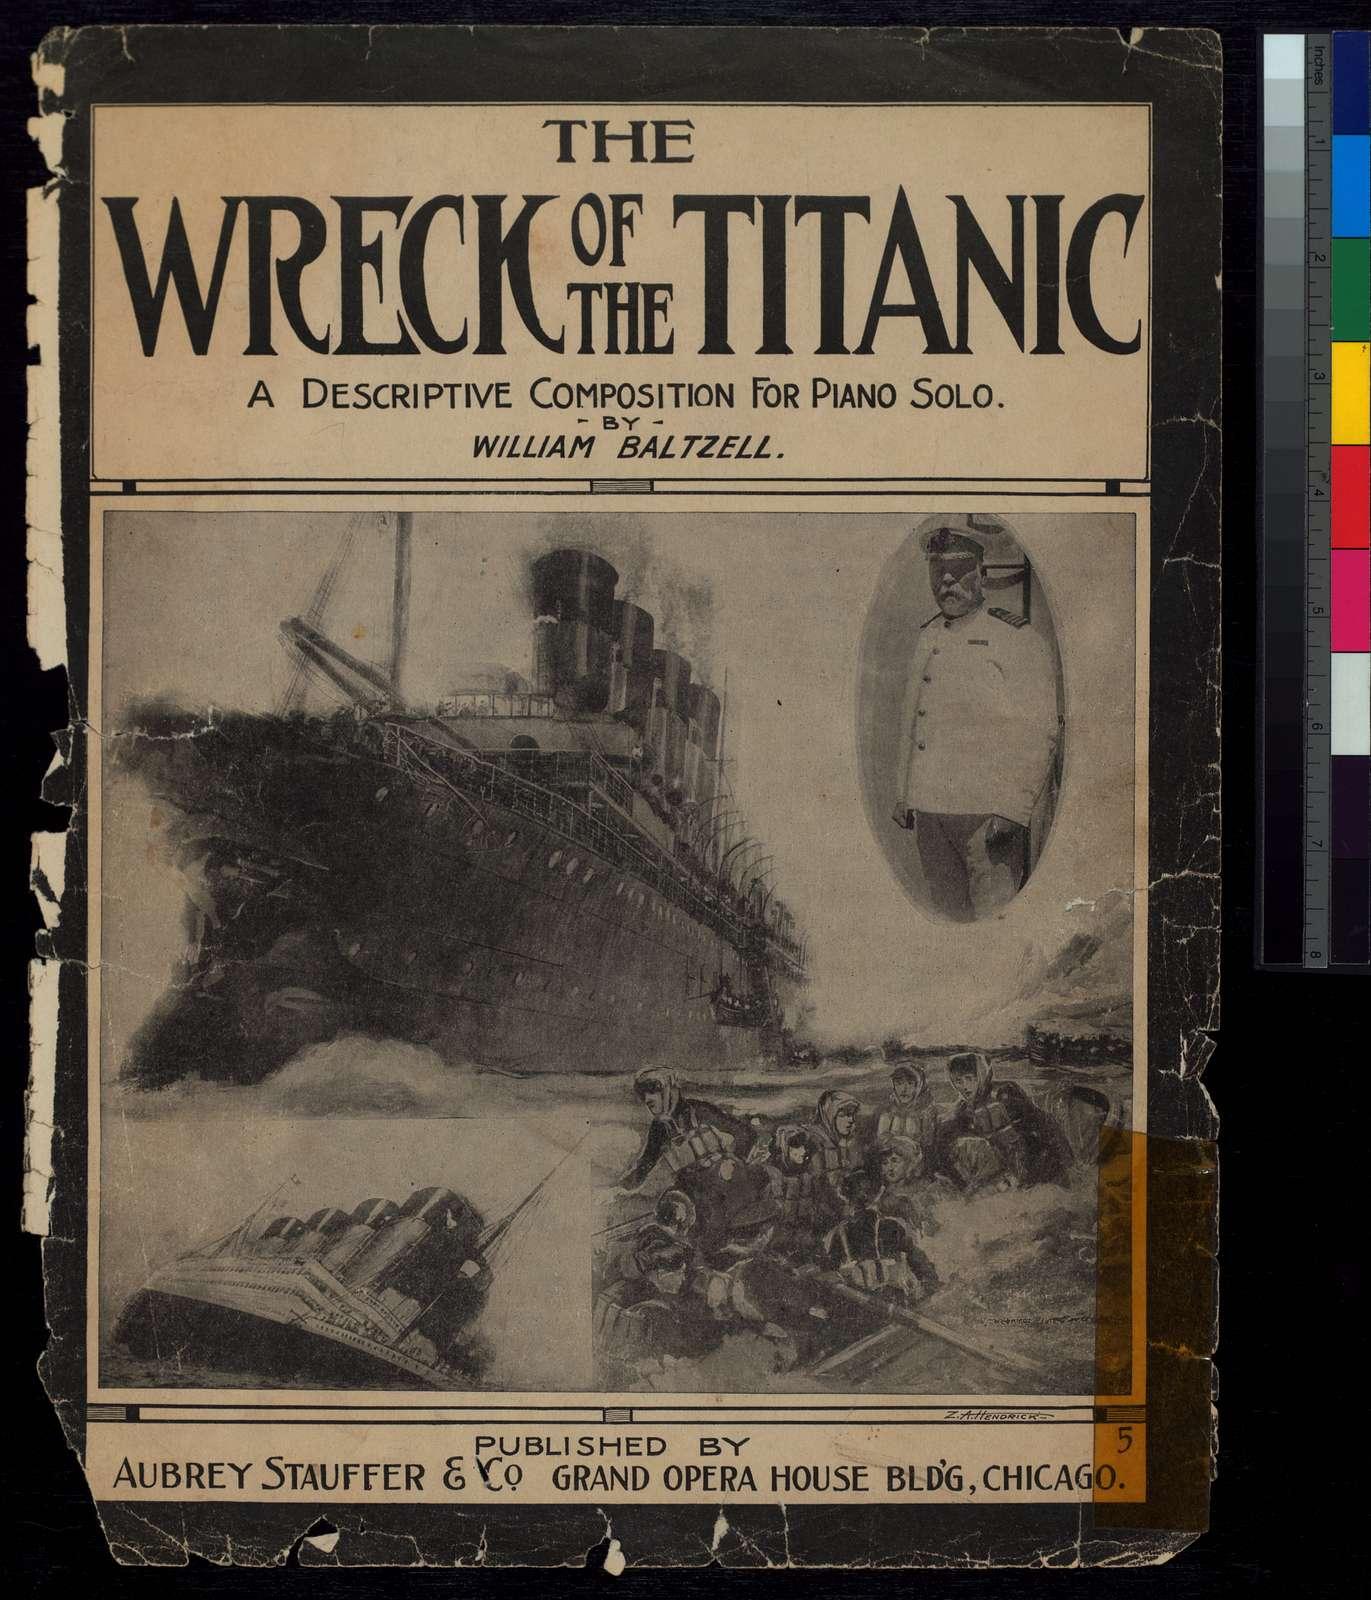 The wreck of the Titanic: piano solo